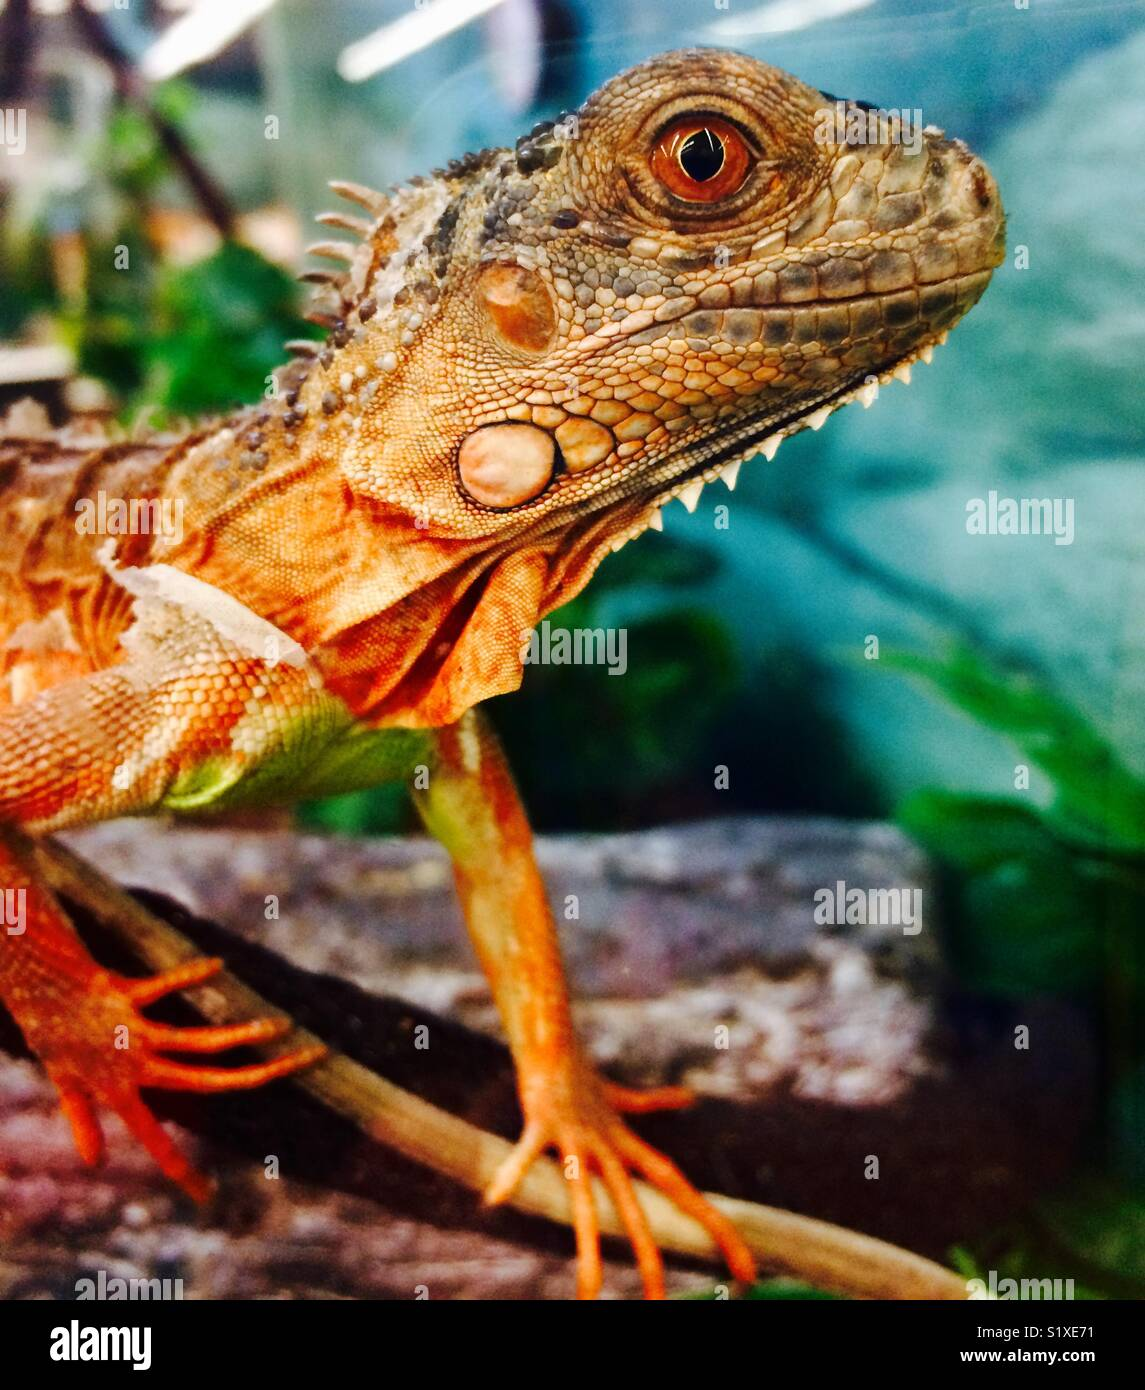 Lizard or iguana - Stock Image